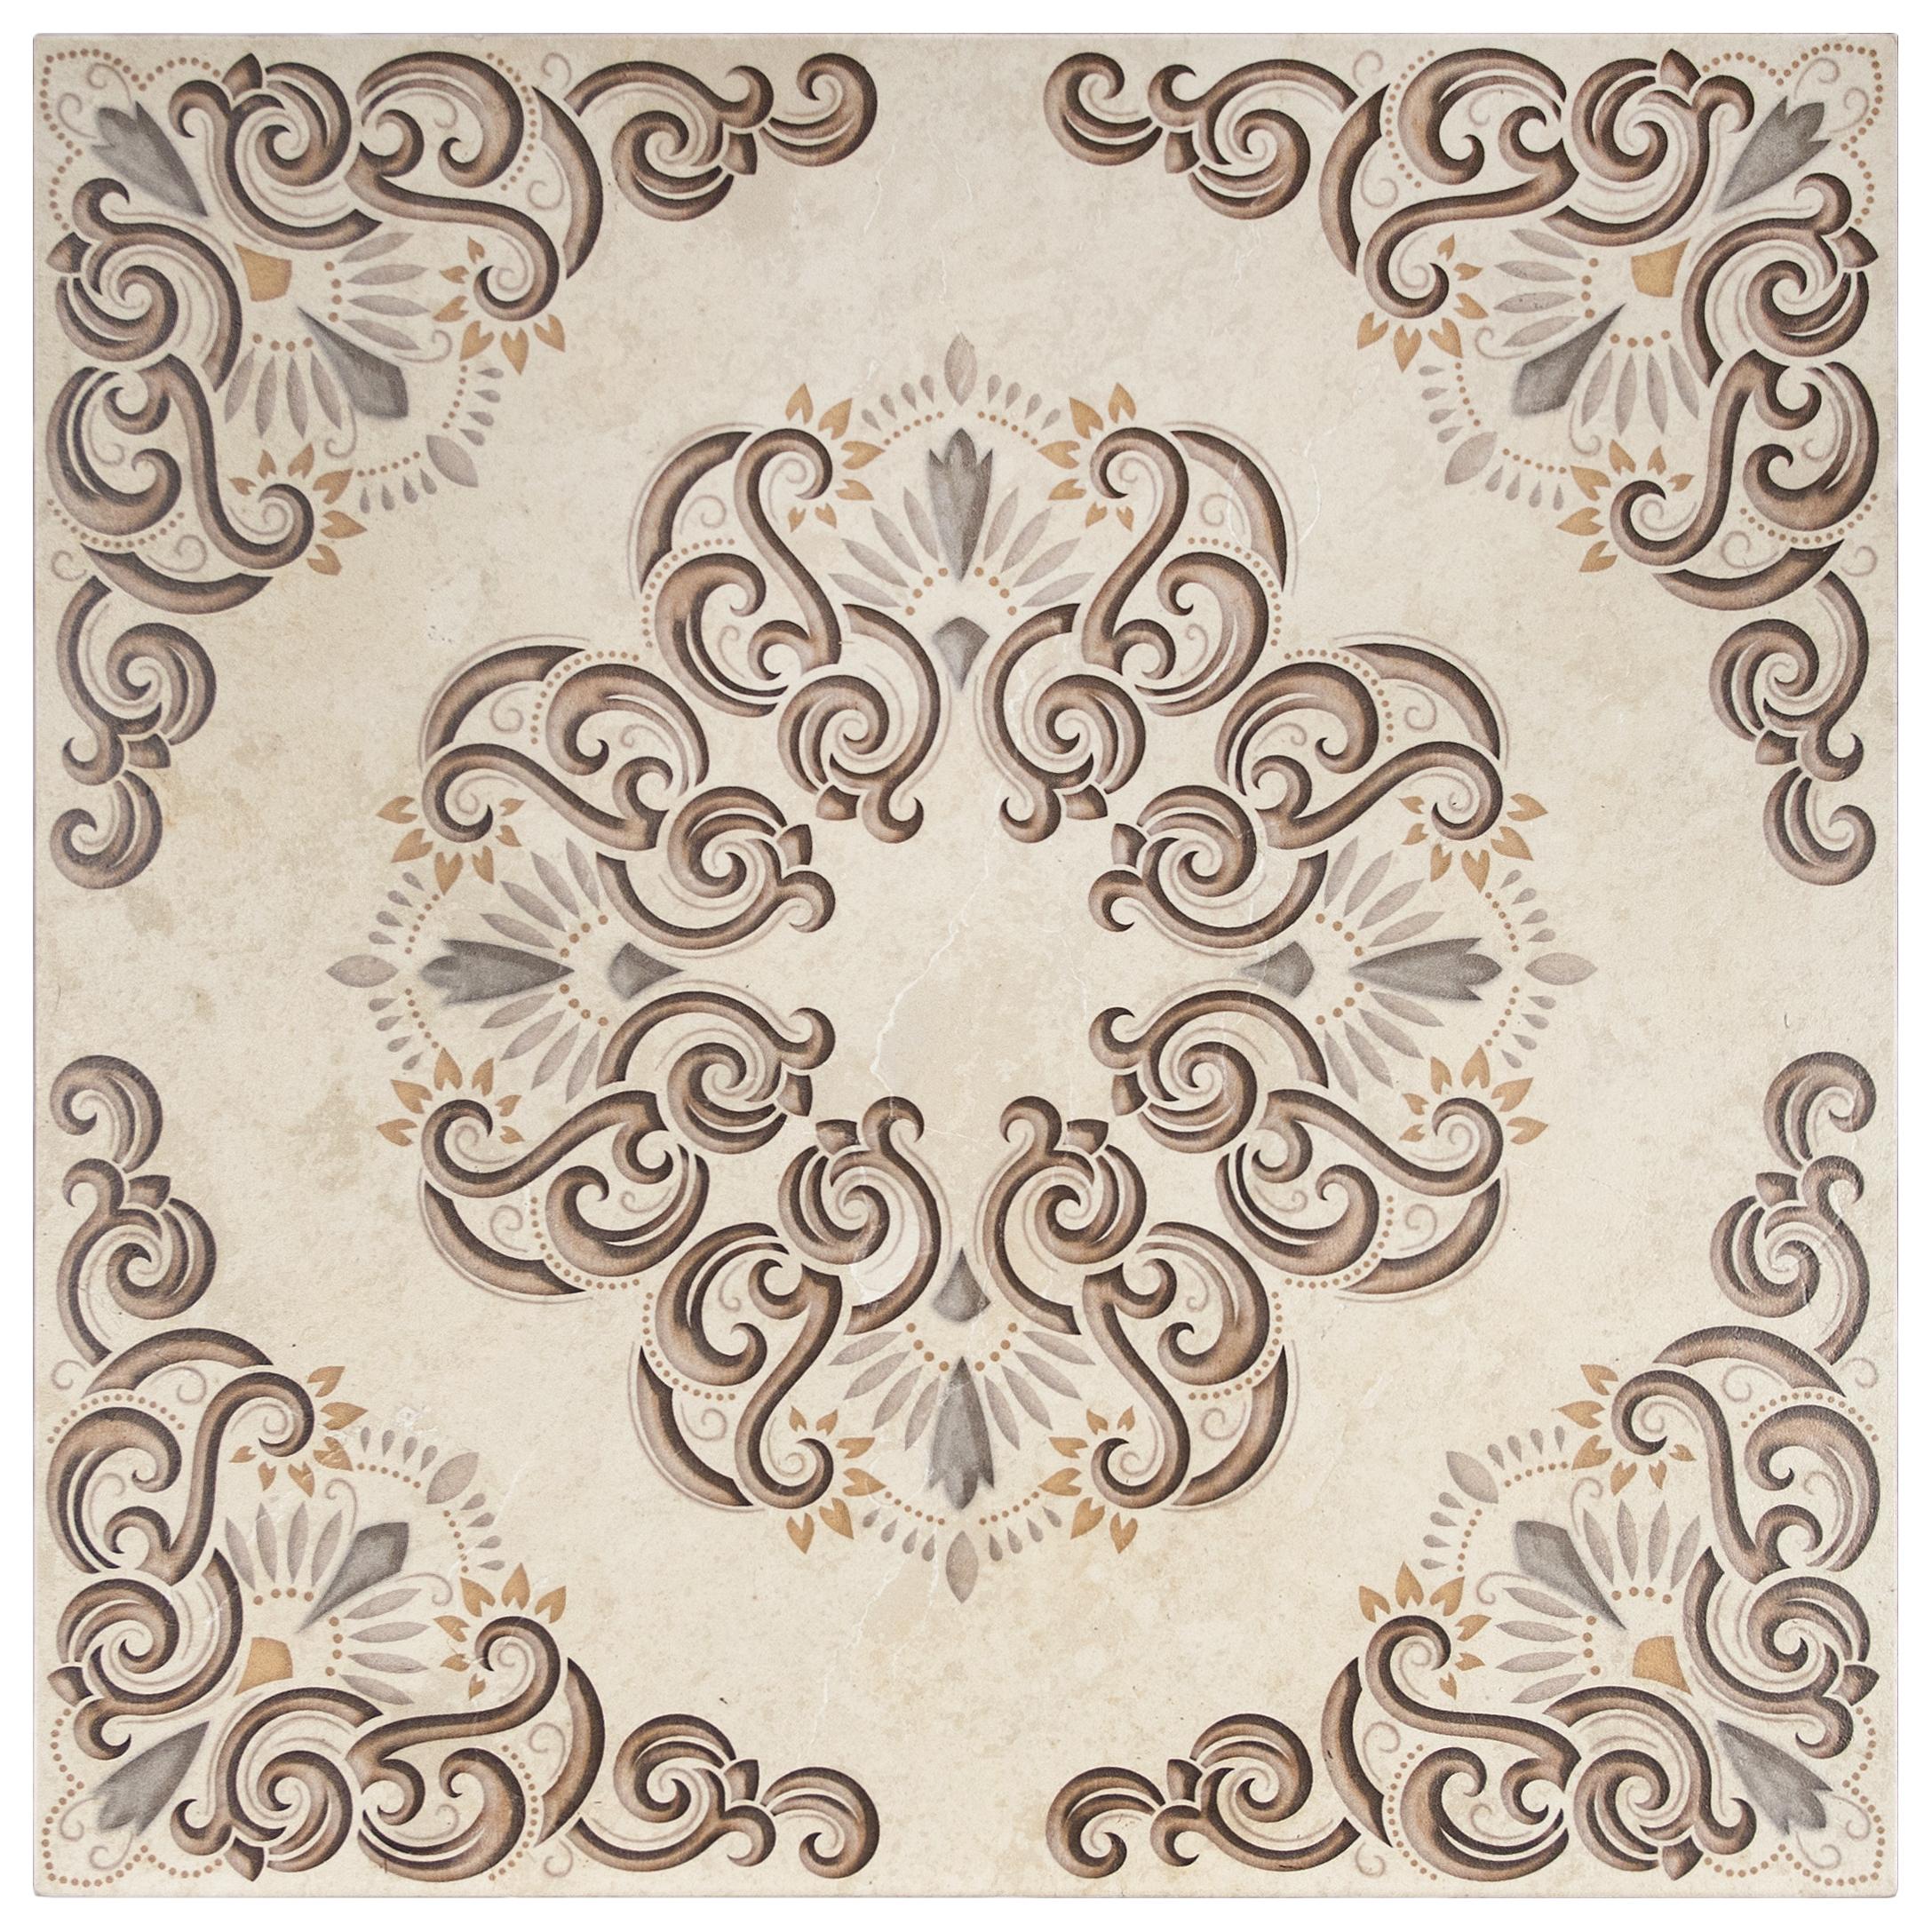 New Decorative Tiles Phoenix Az Ceramic Tile Amp Stone